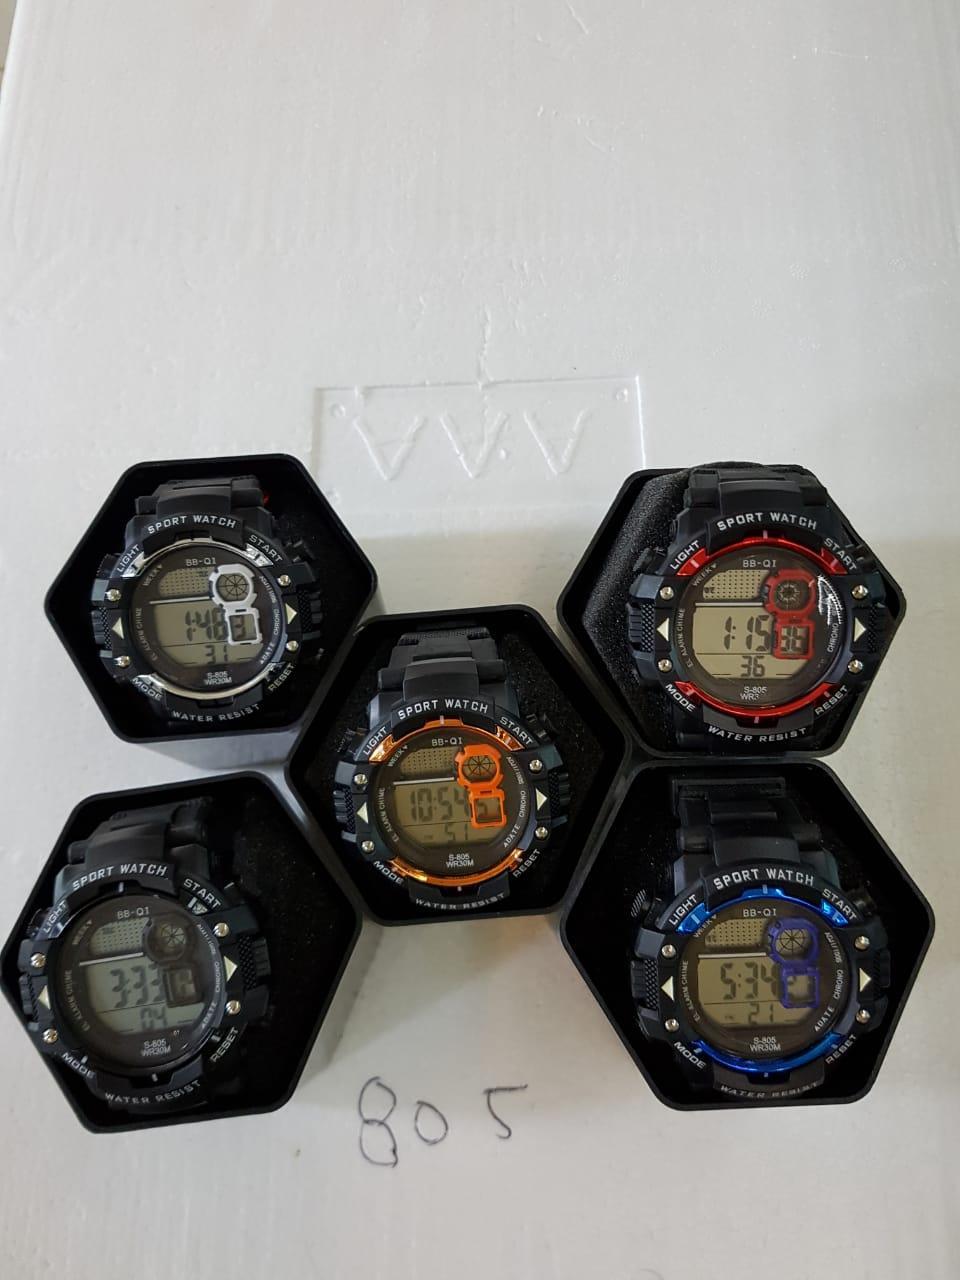 Katalog Produk Jam Tangan Pria Digital Sangat Baru Bhinekashop Skmei Ad1202 Analog Sport Cowok Led Casio Baby G Shock Fortuner Wr 50m 1202 Casual